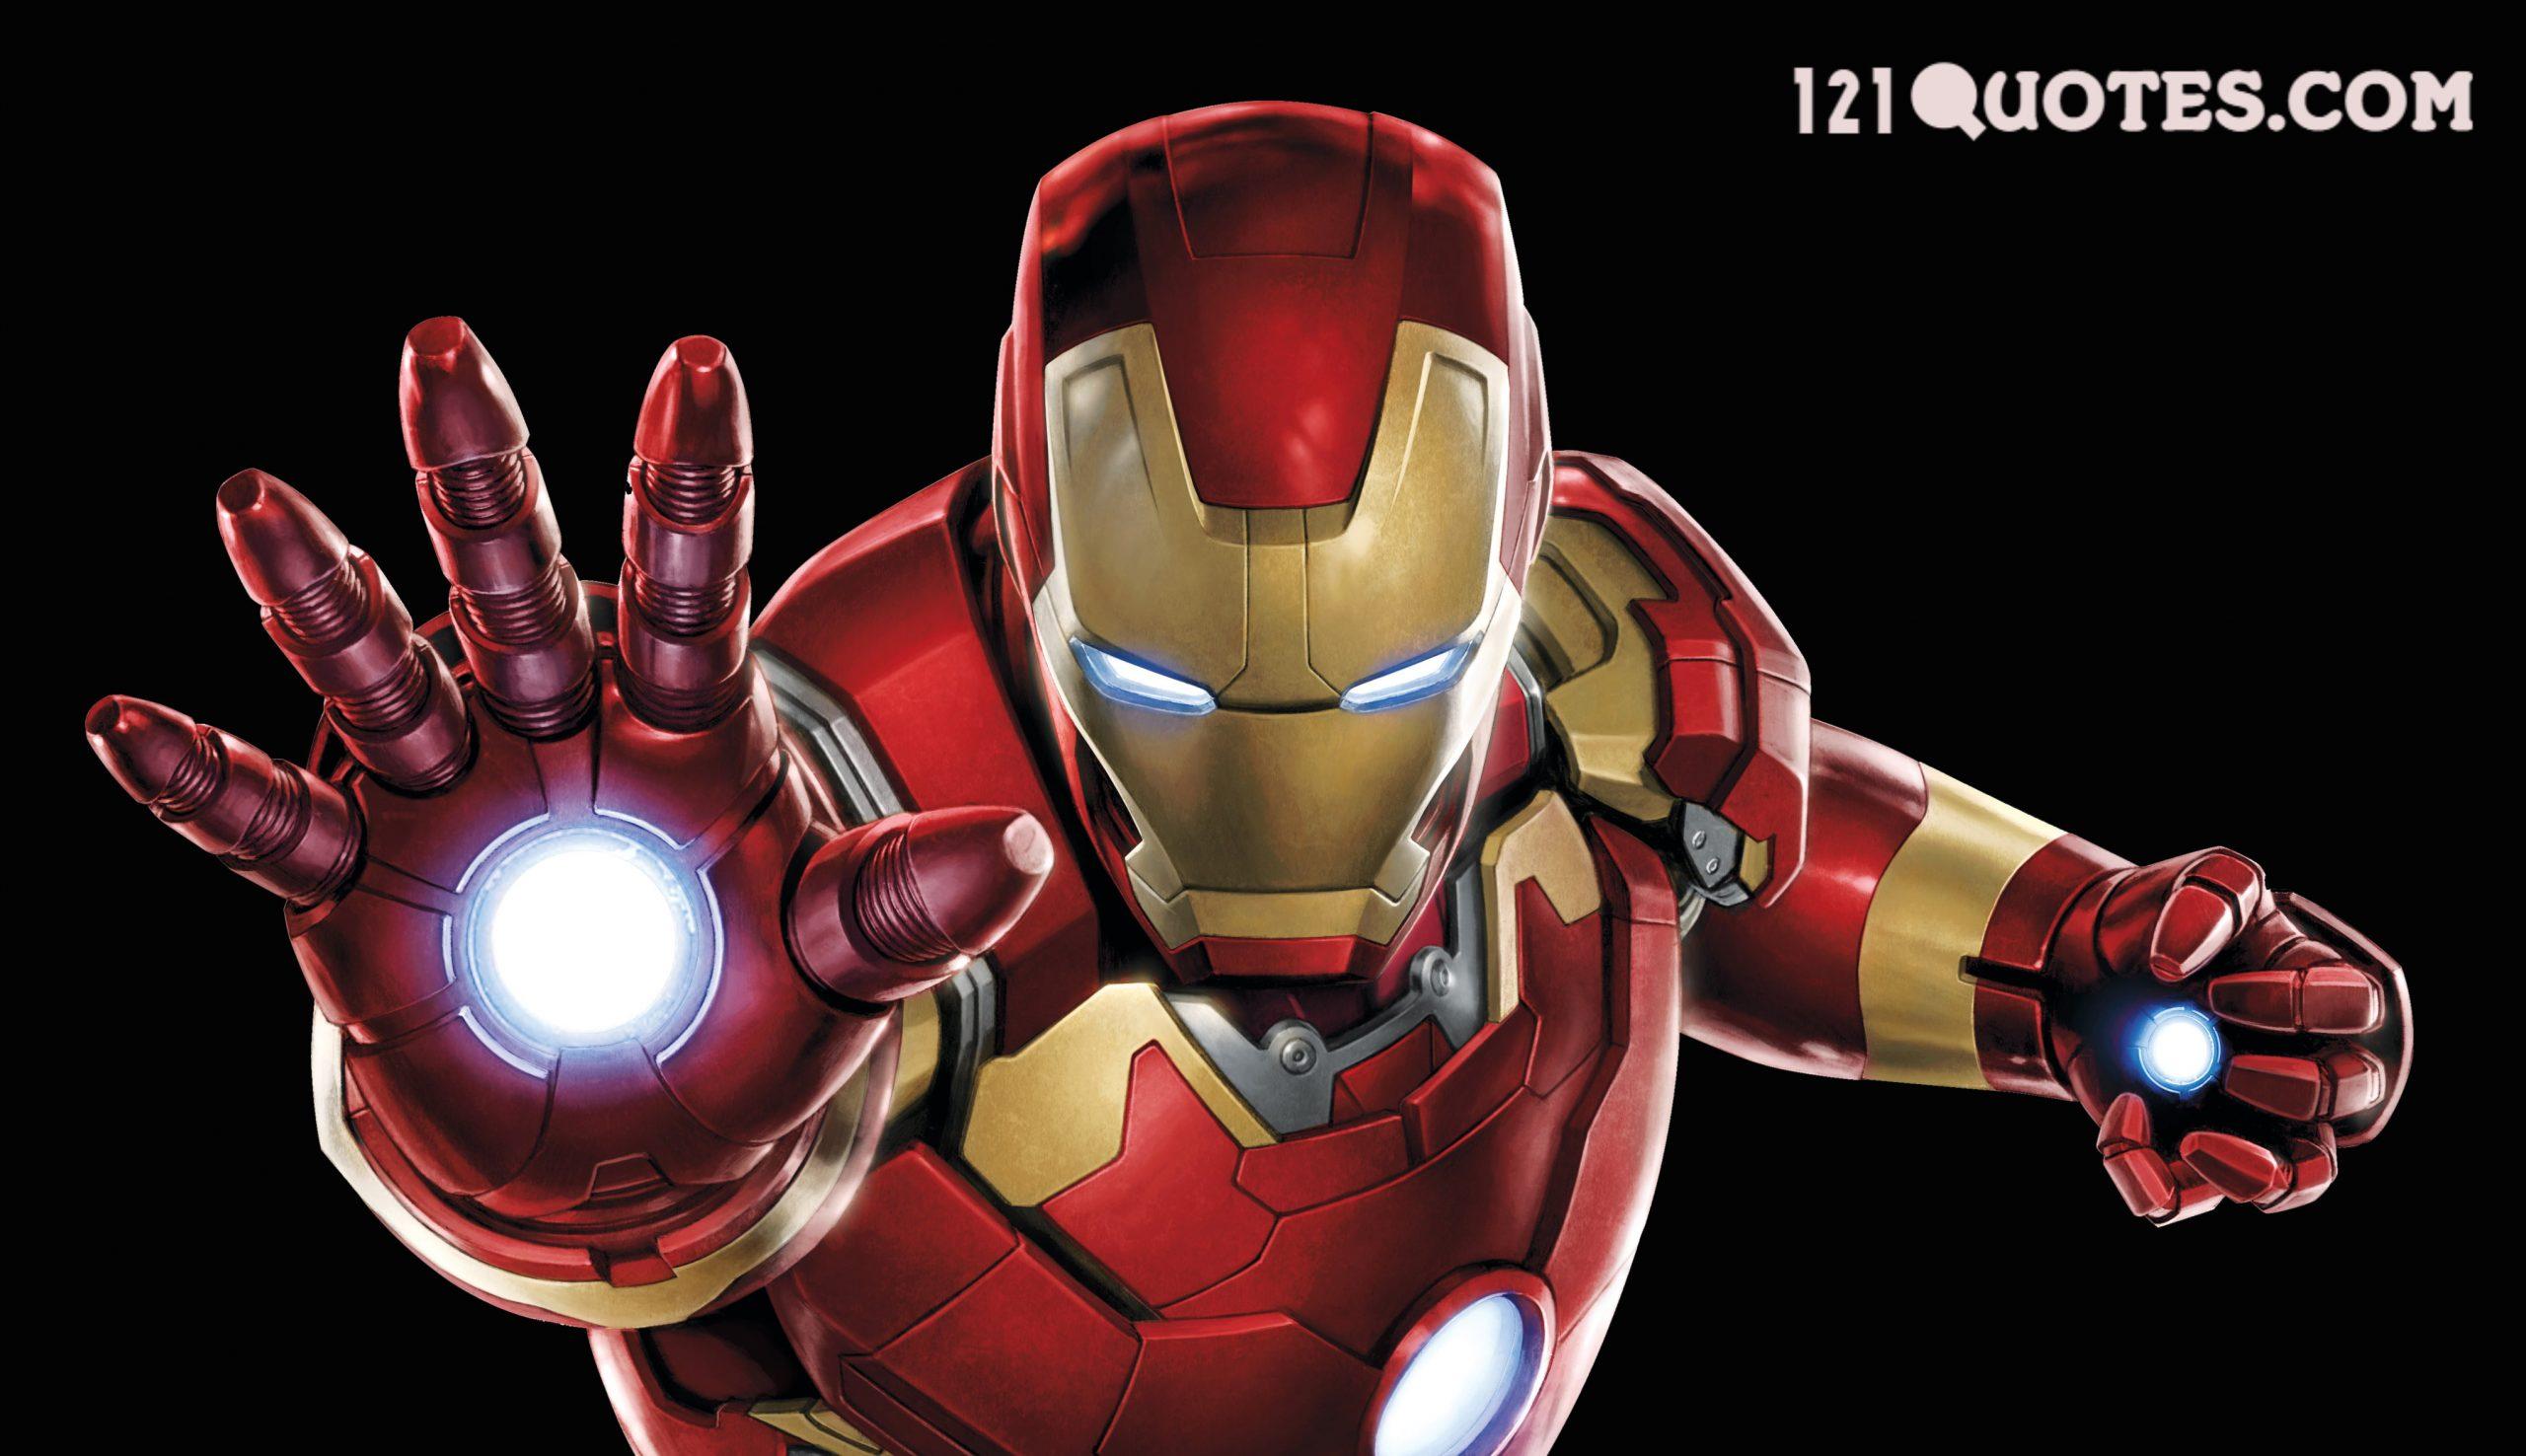 iron man wallpaper hd 4k